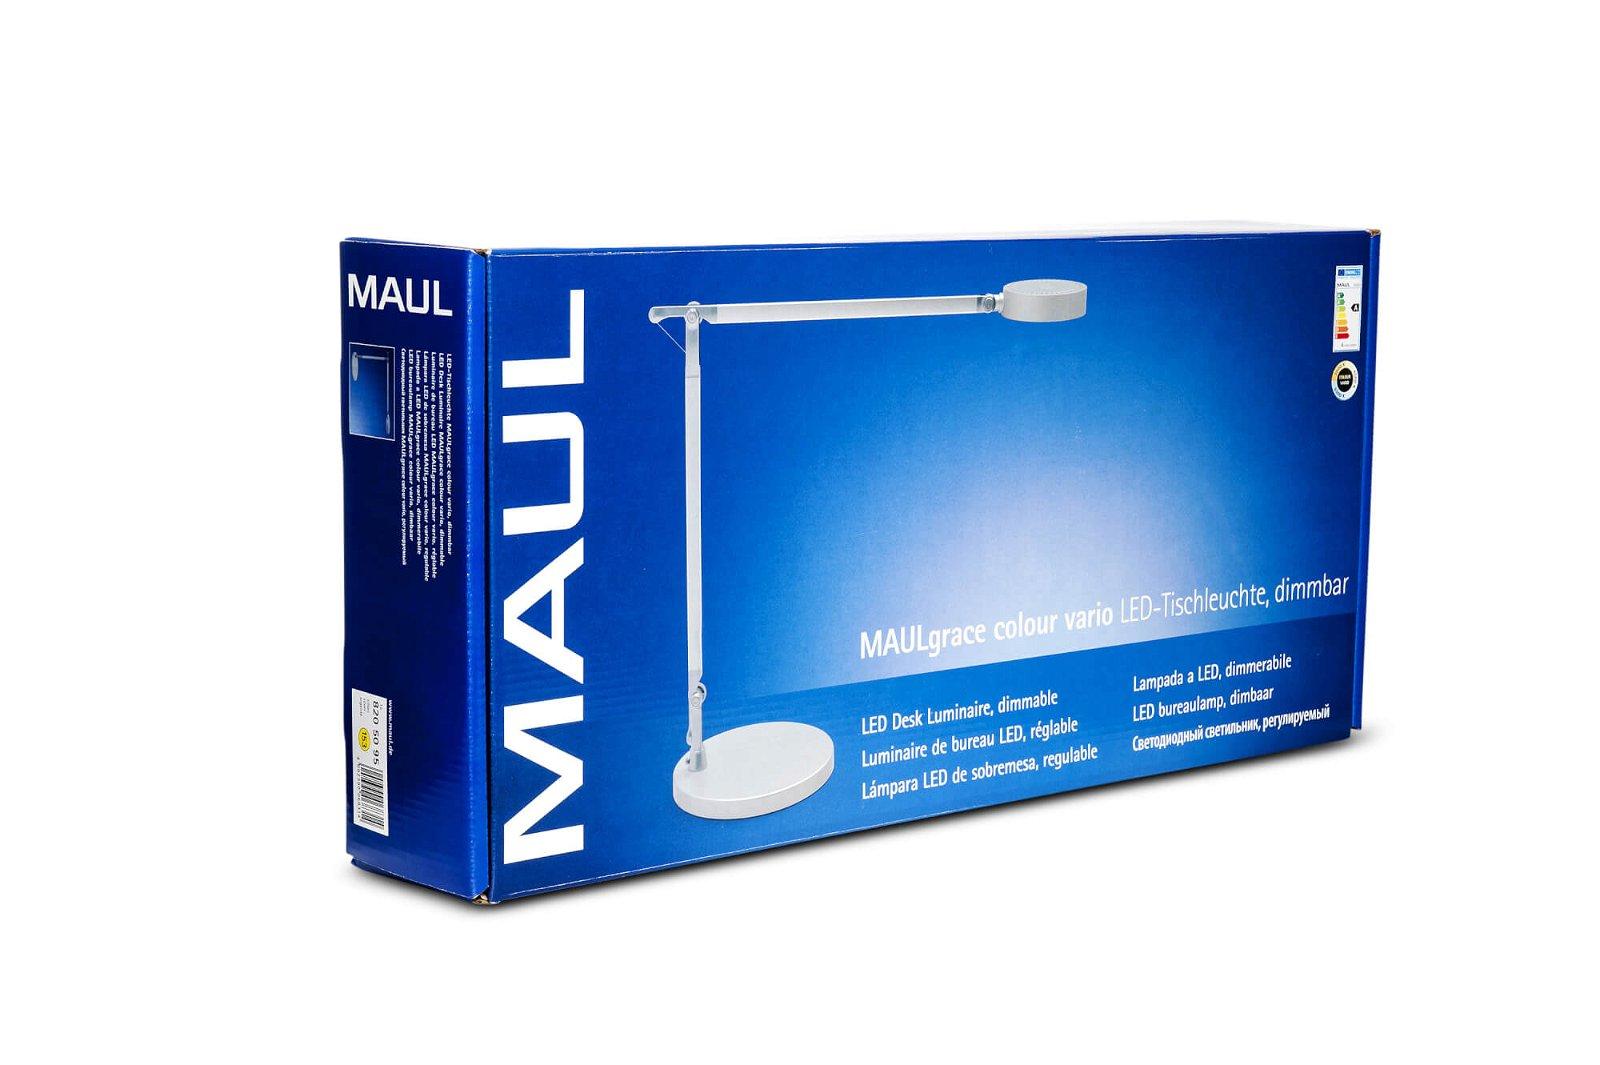 LED-Tischleuchte MAULgrace